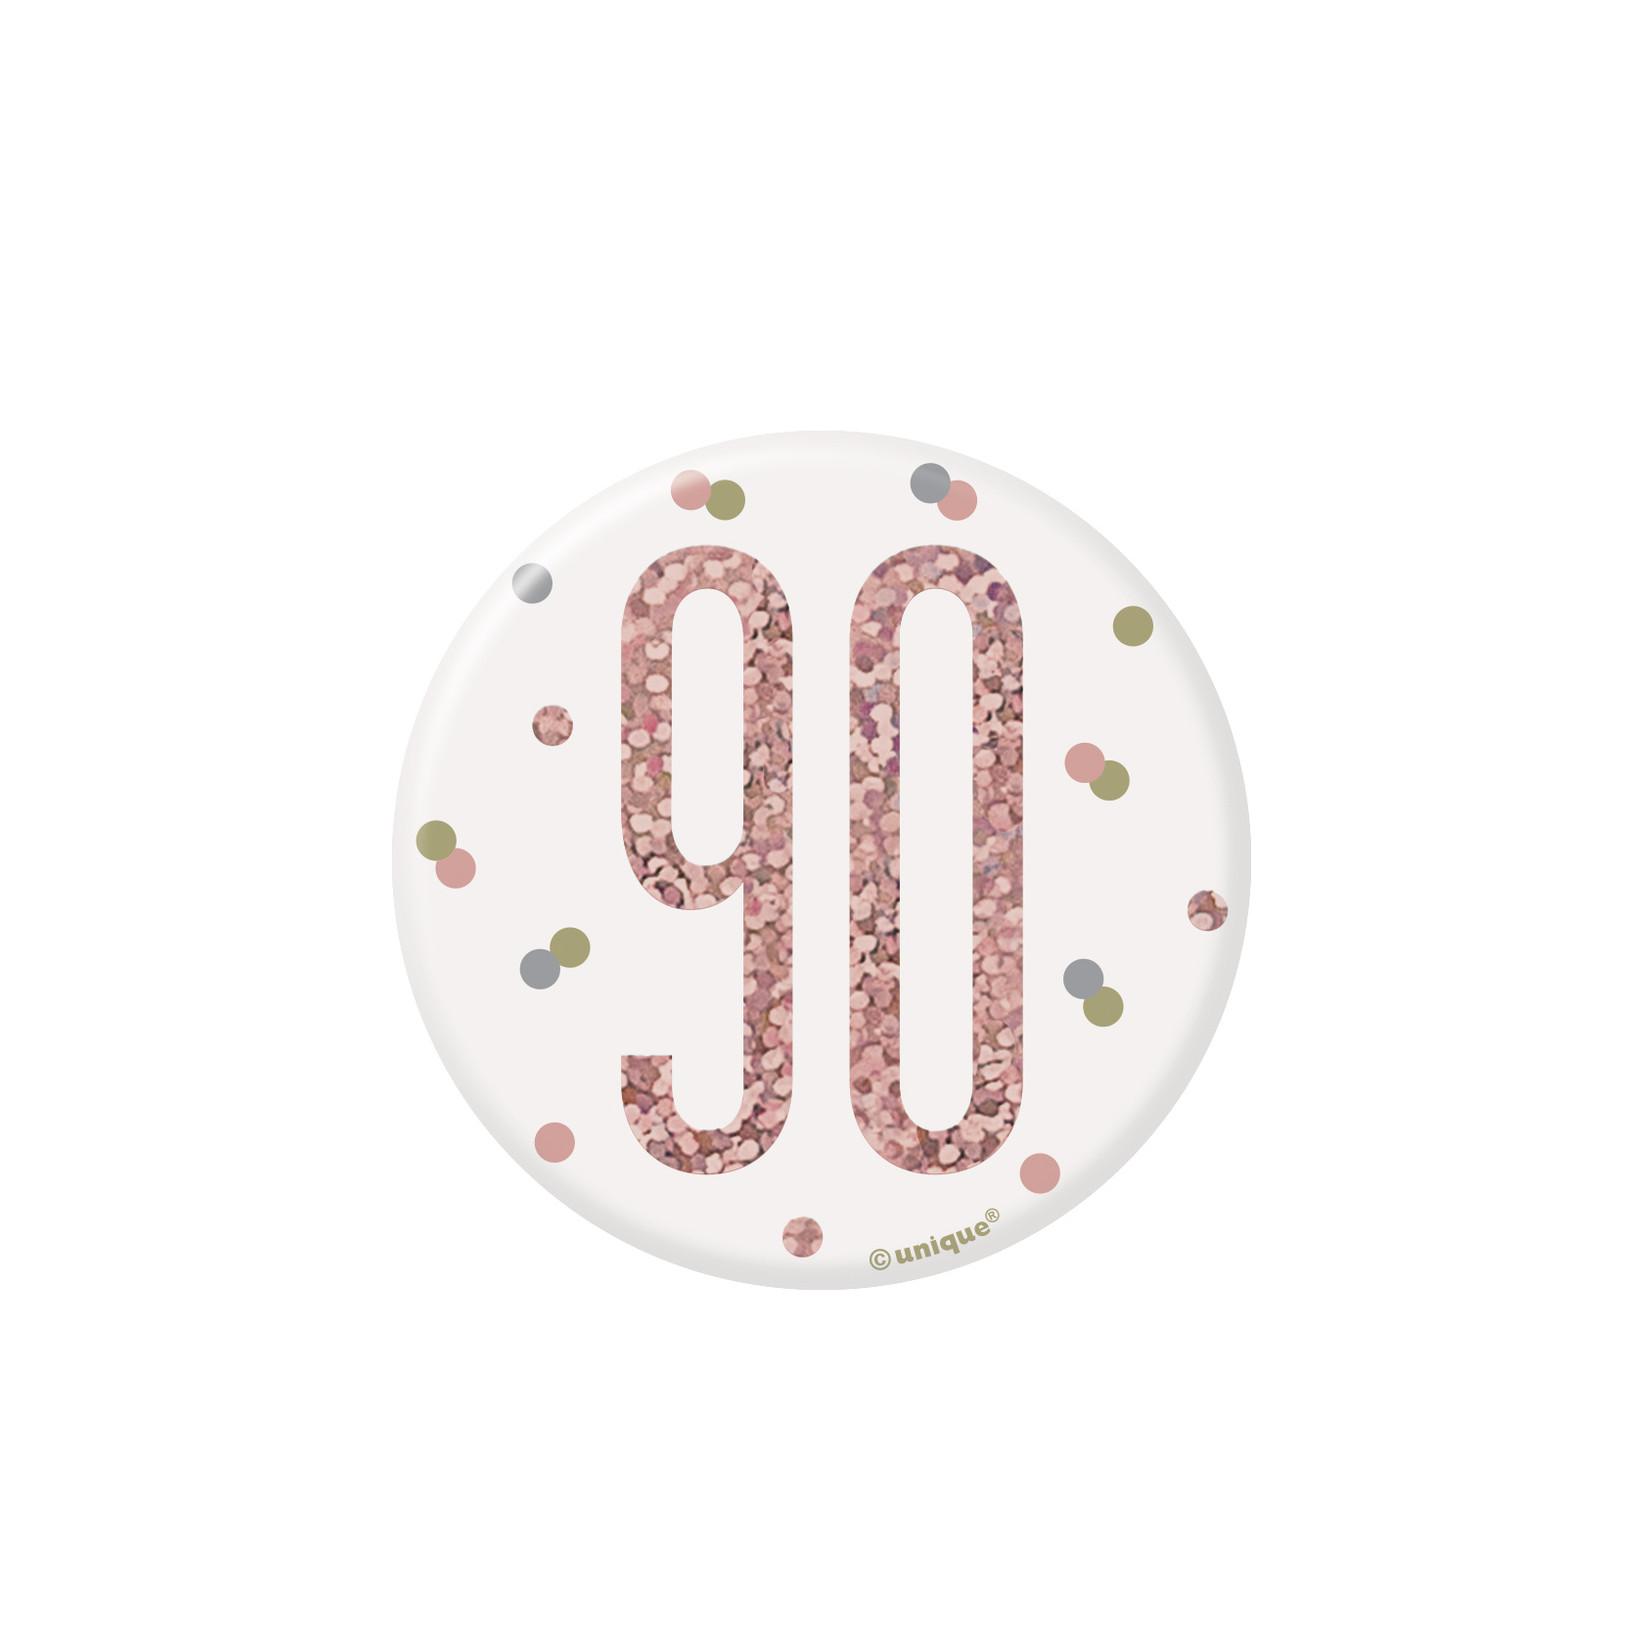 Badge-90th Birthday-Glitz Rose Gold-1ct